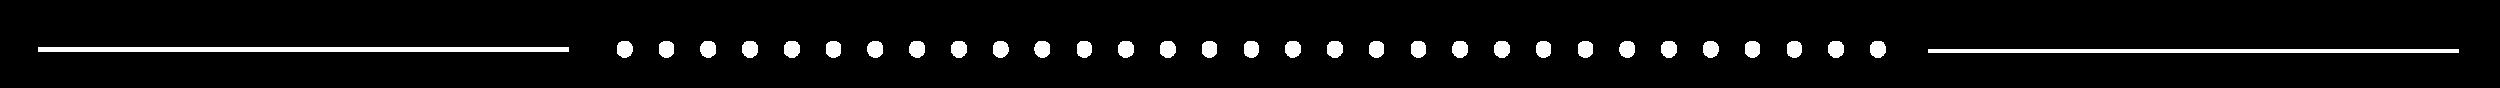 dot divider - white.png